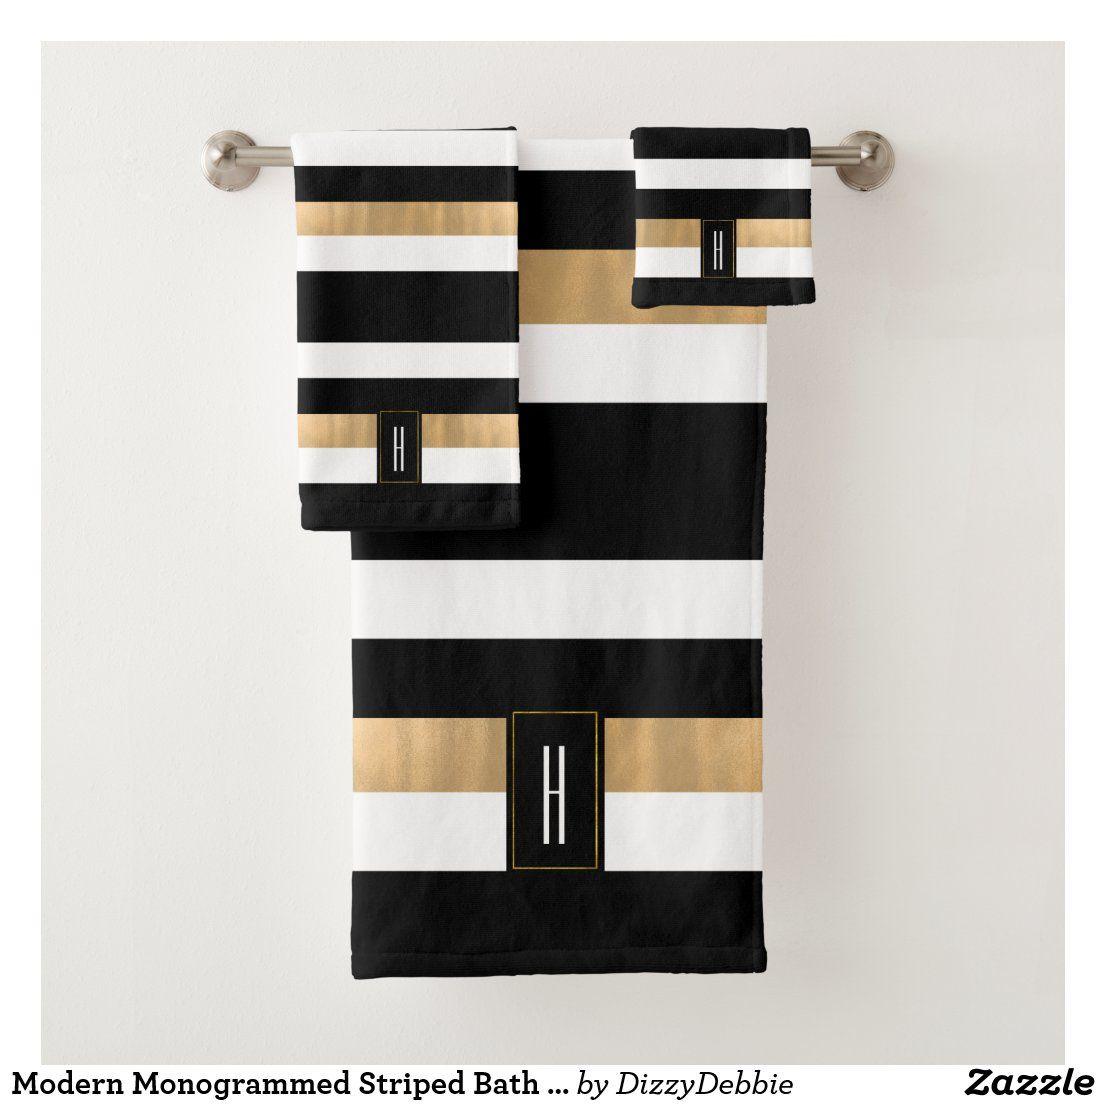 Modern Monogrammed Striped Bath Towel Set  Zazzle.com in 6